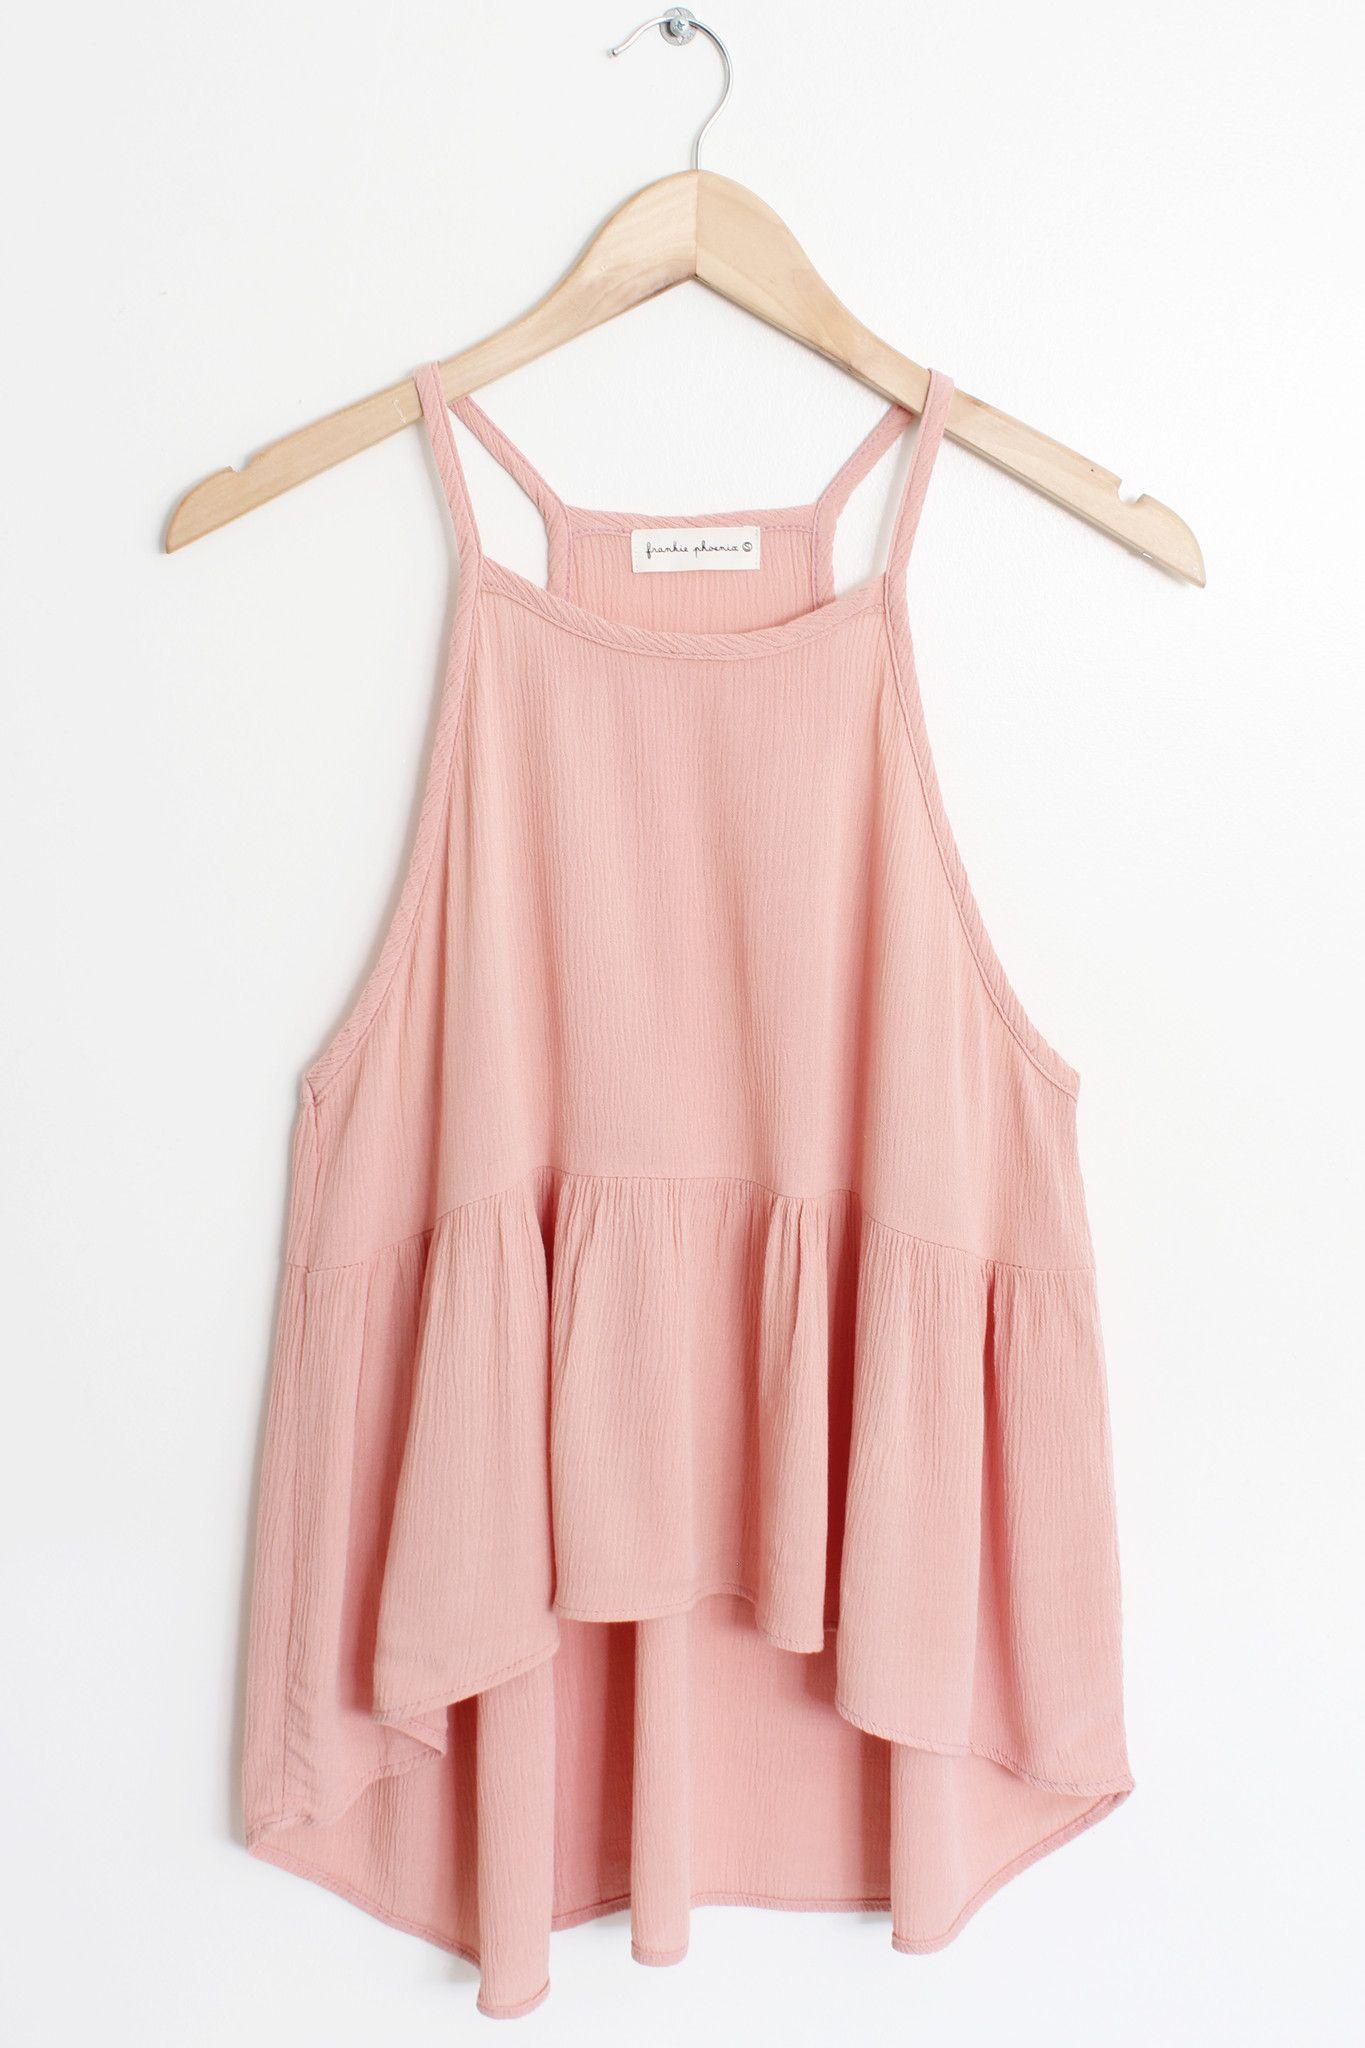 Pin de Natasha T en Clothing ~ single pieces | Pinterest | Blusas ...